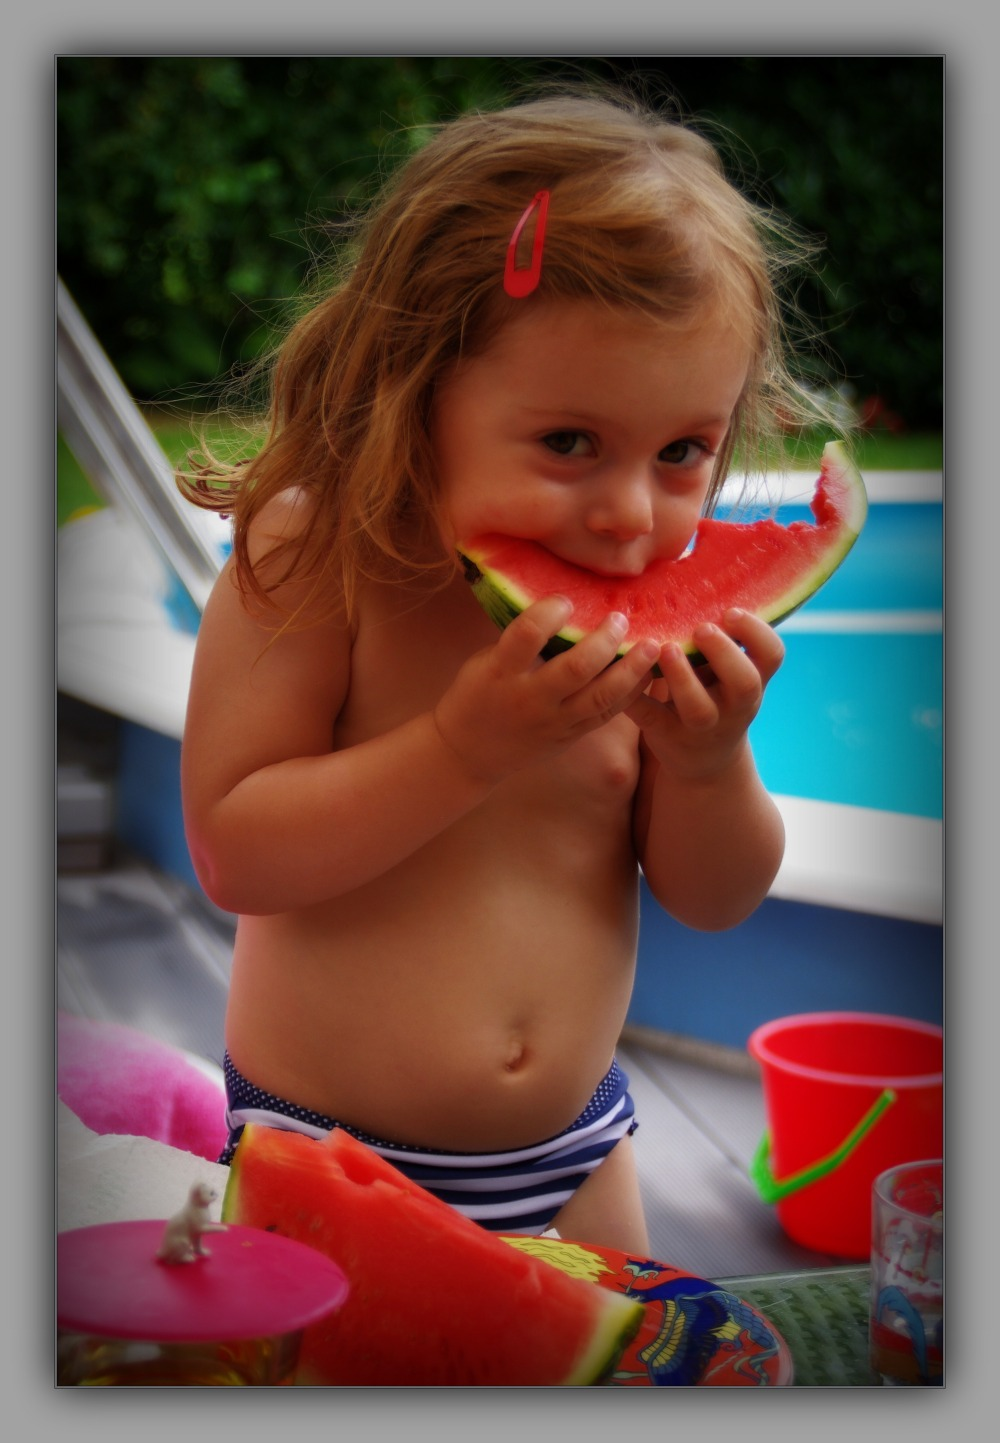 emilia, 34 months old